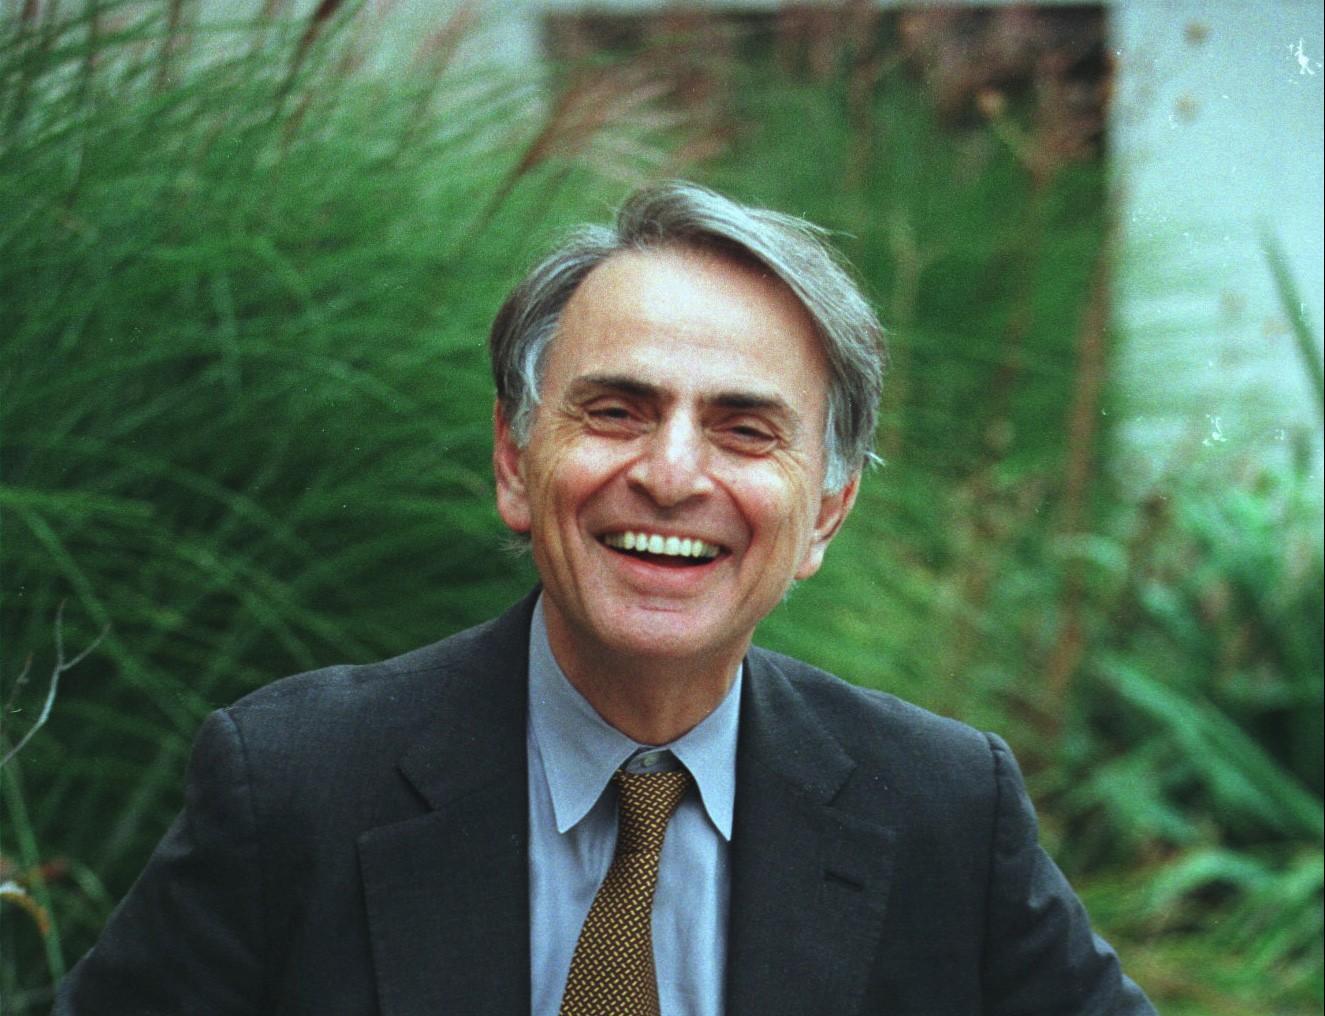 filme biográfico sobre Carl Sagan